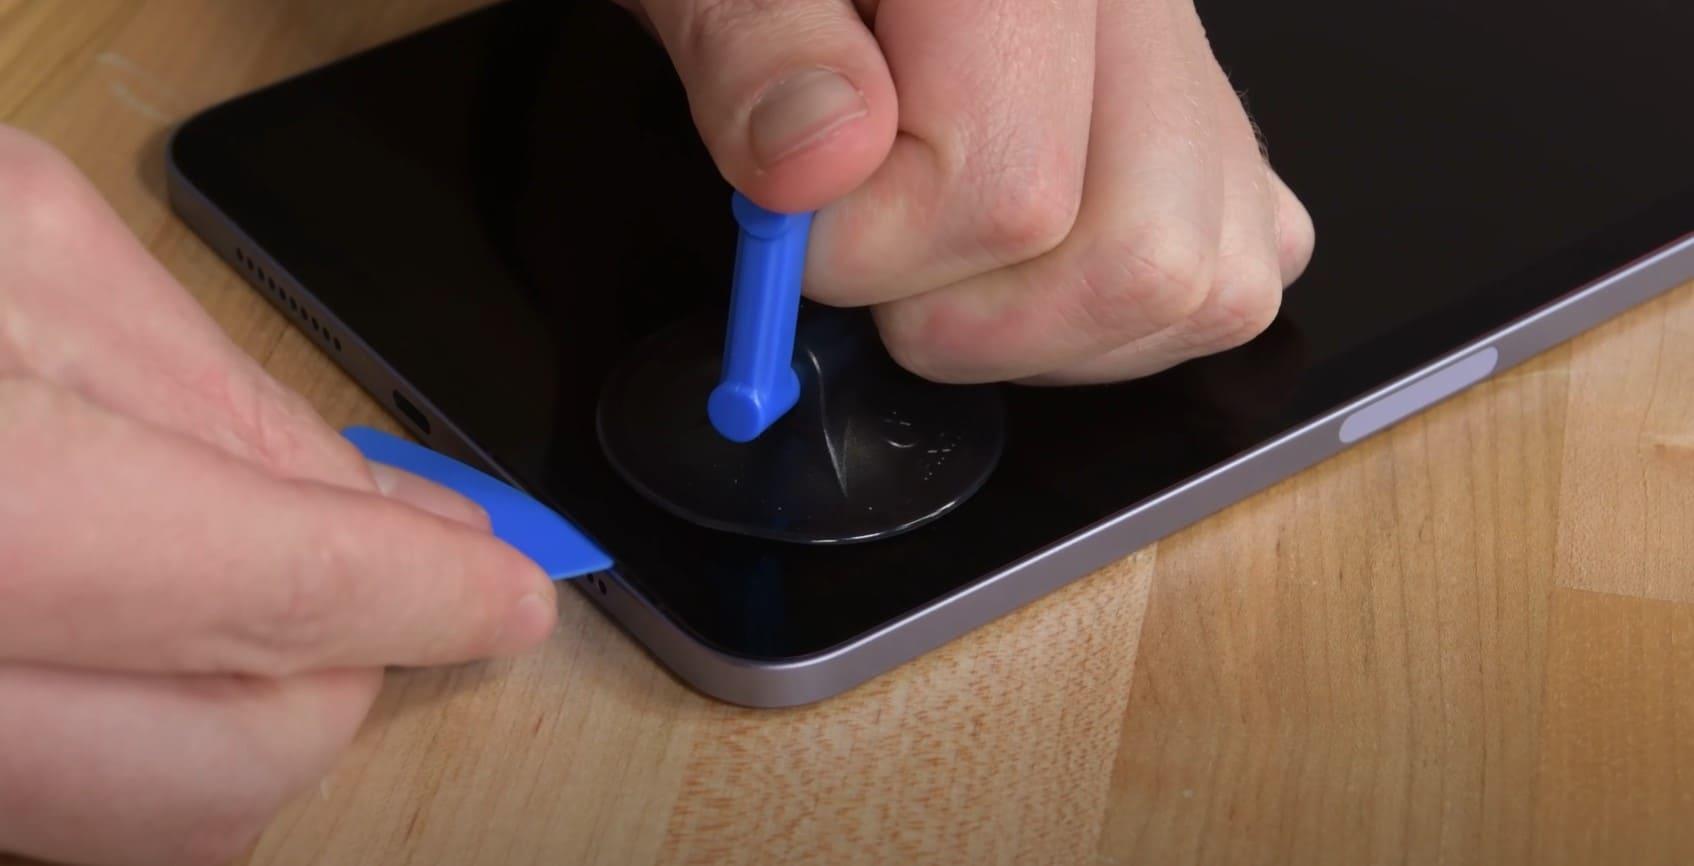 desmontaje-iPad-mini-2021-quitar-tapa